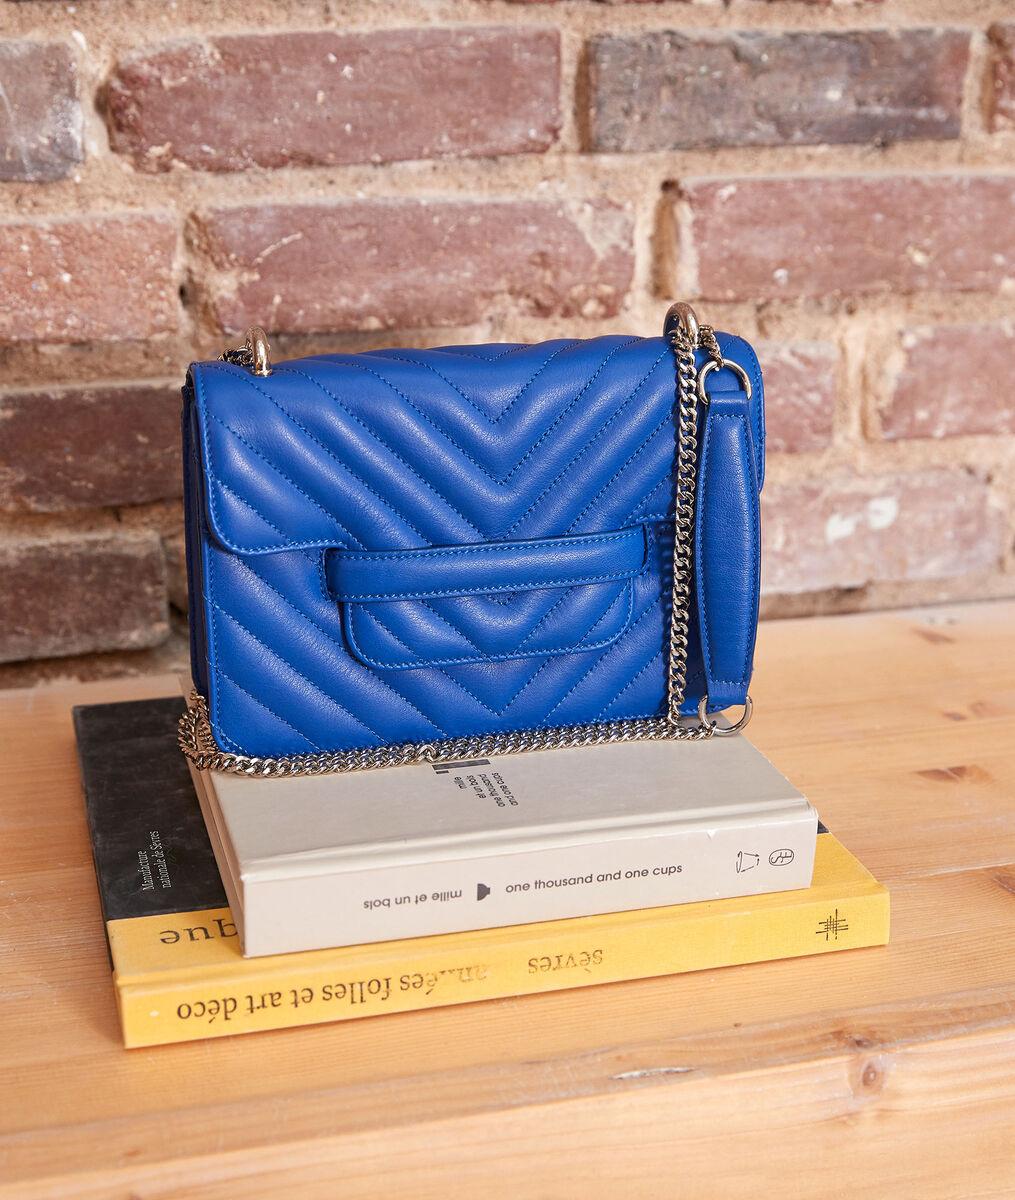 Le mini 123 matelassé bleu klein PhotoZ   1-2-3